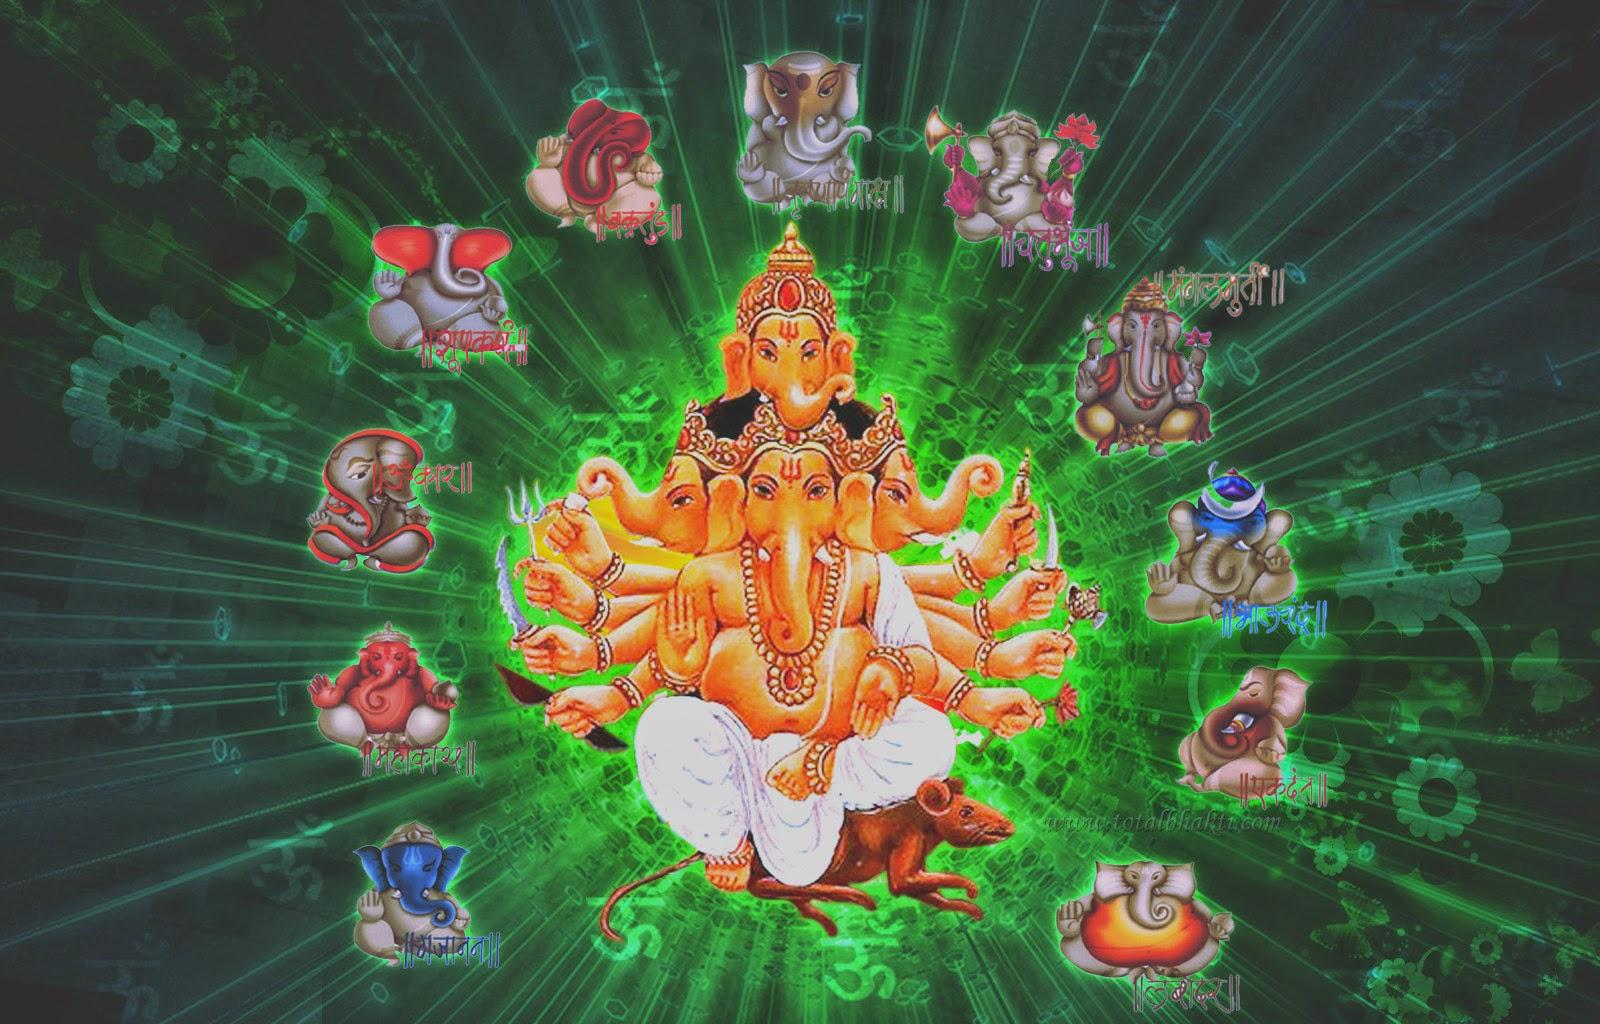 Ganpati Bappa Morya, Free Full Size HD Wallpapers